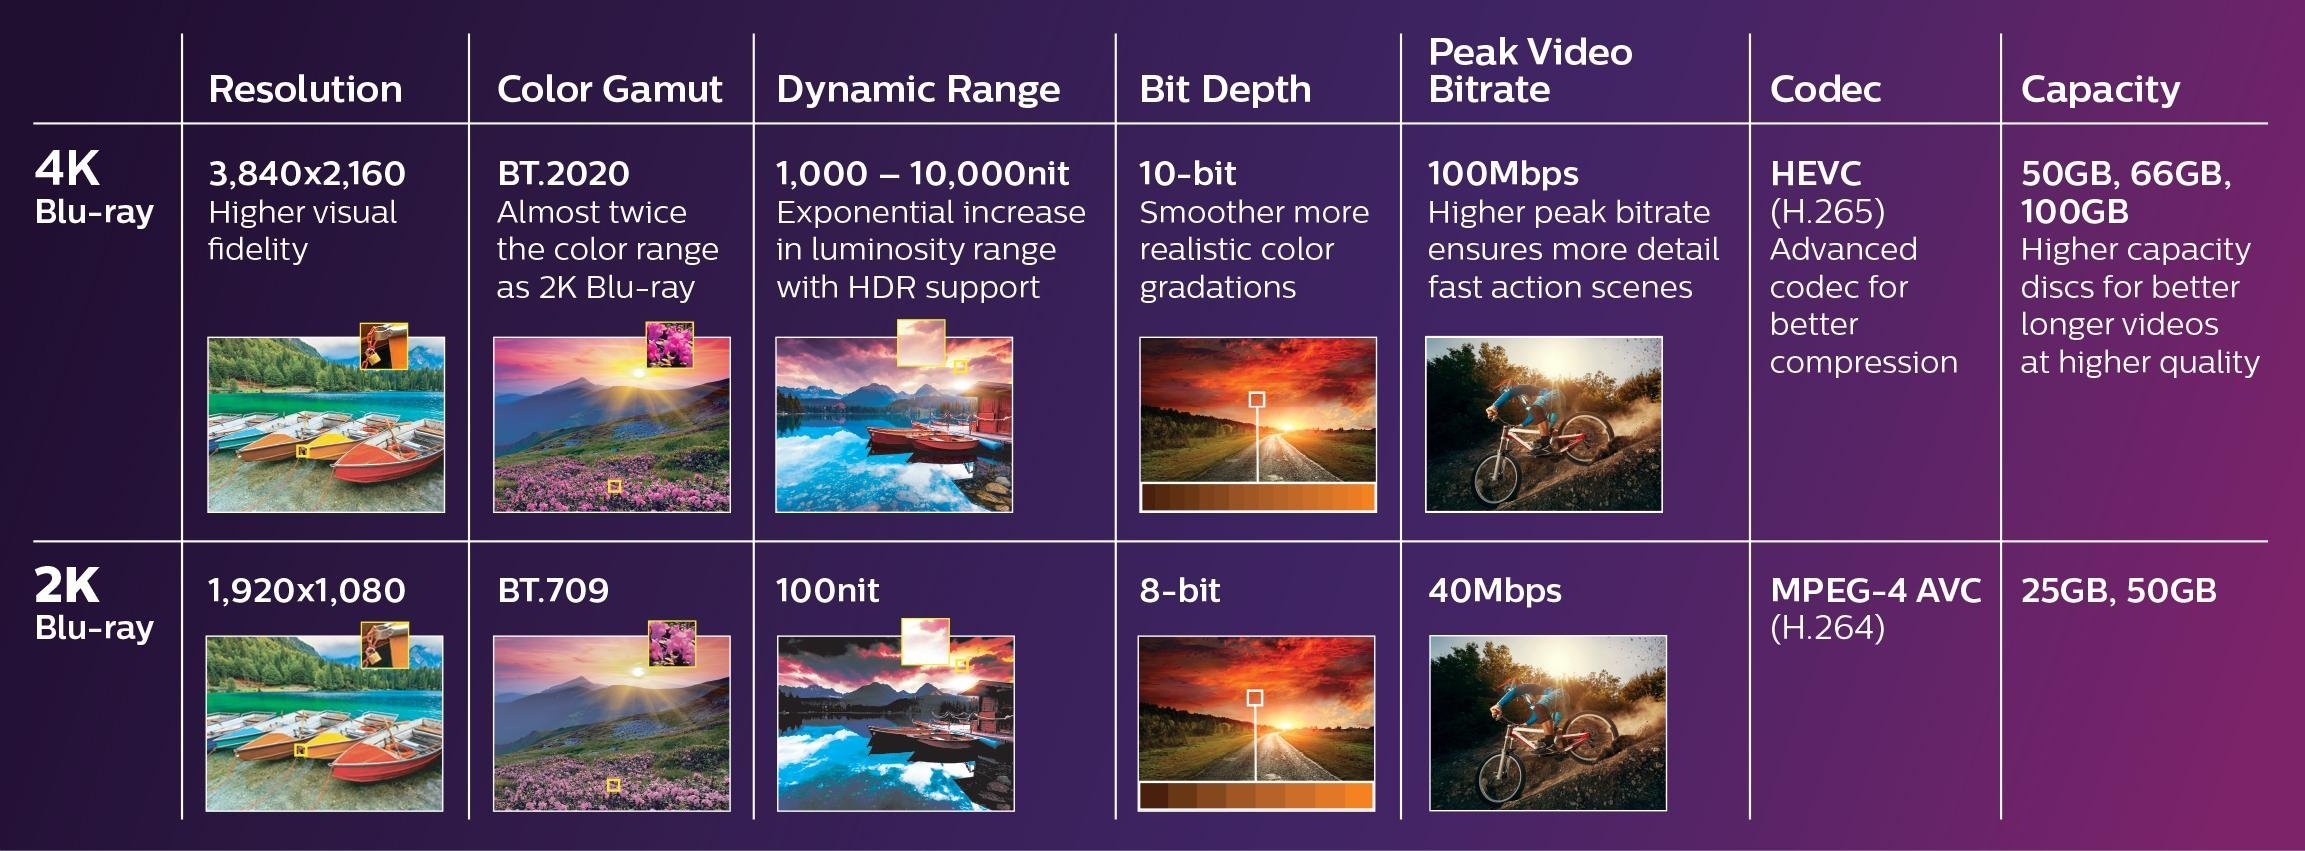 Amazon.com: Philips BDP7501 4K Ultra HD Blu-Ray Player